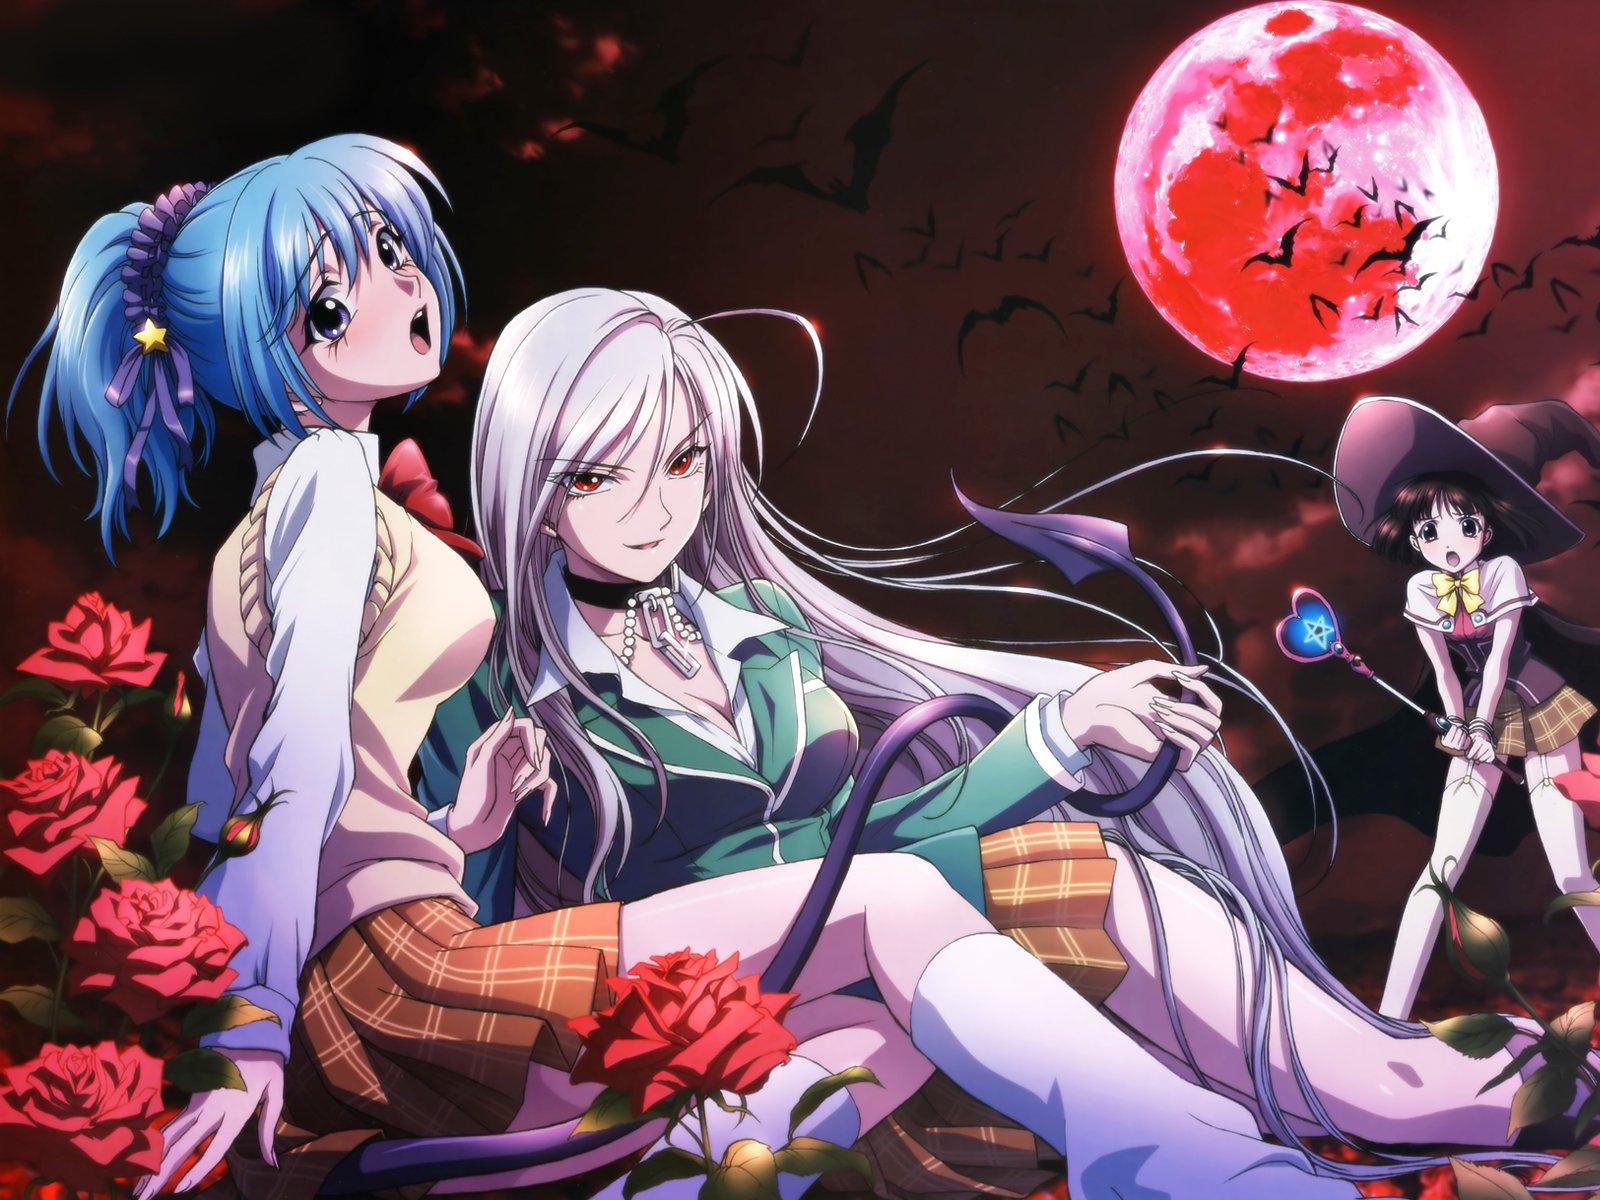 Rosario vampire wallpaper and background image - Wallpaper vampire anime ...